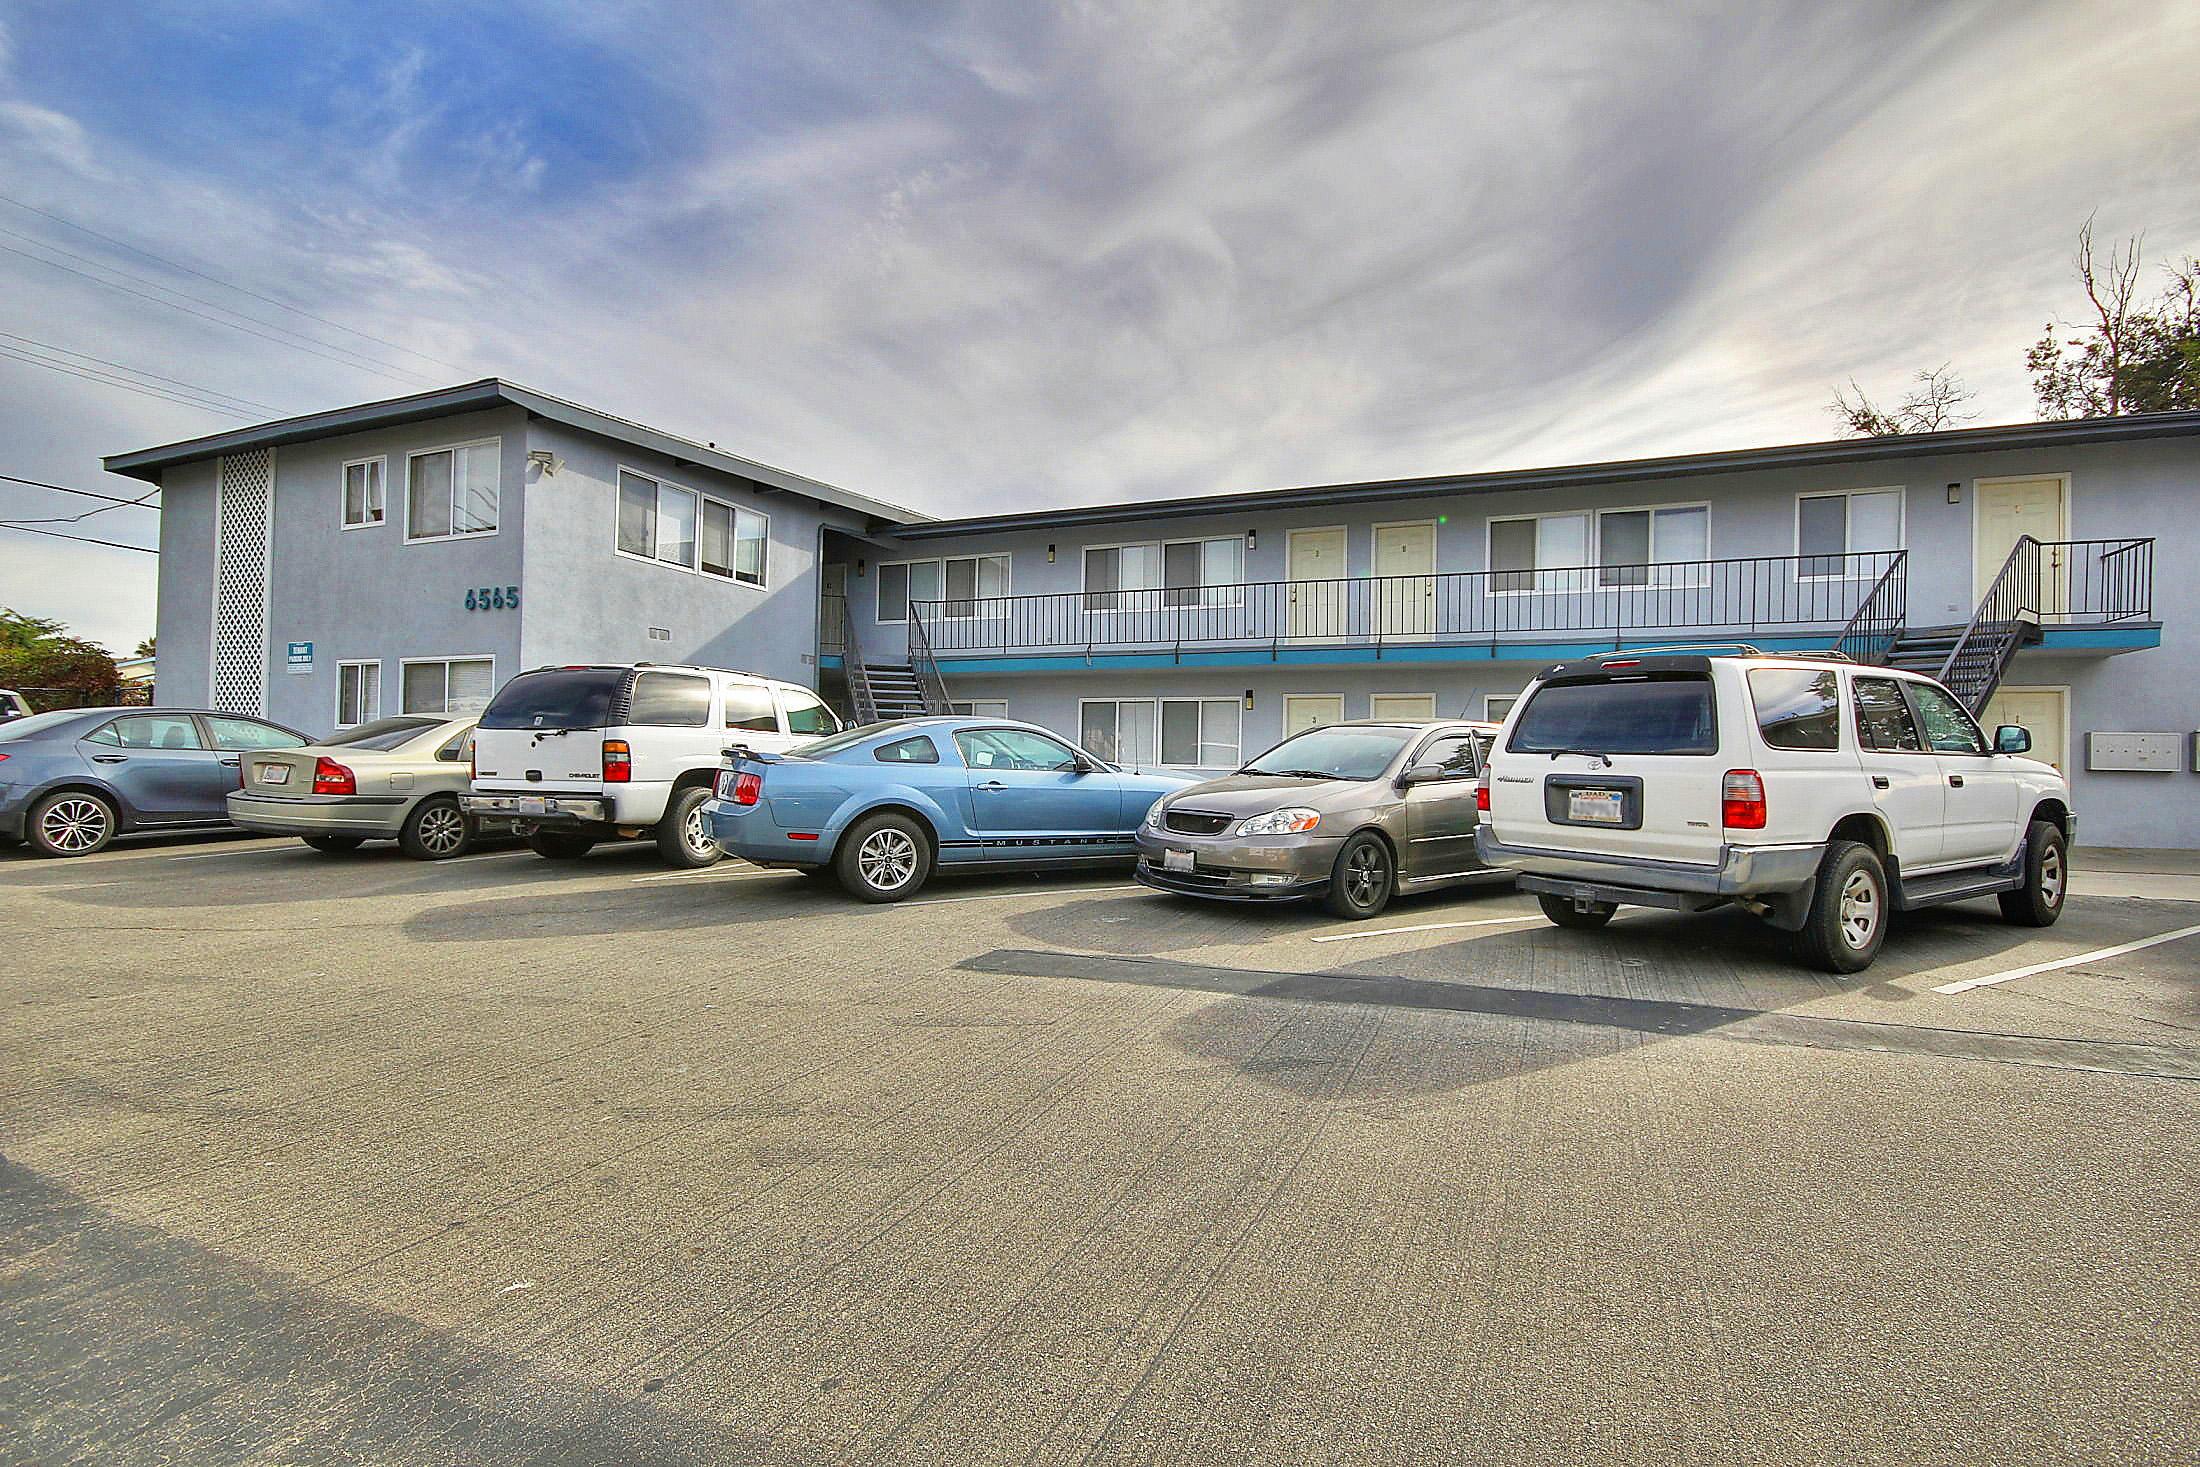 Property photo for 6565 Segovia Rd Goleta, California 93117 - 14-3577